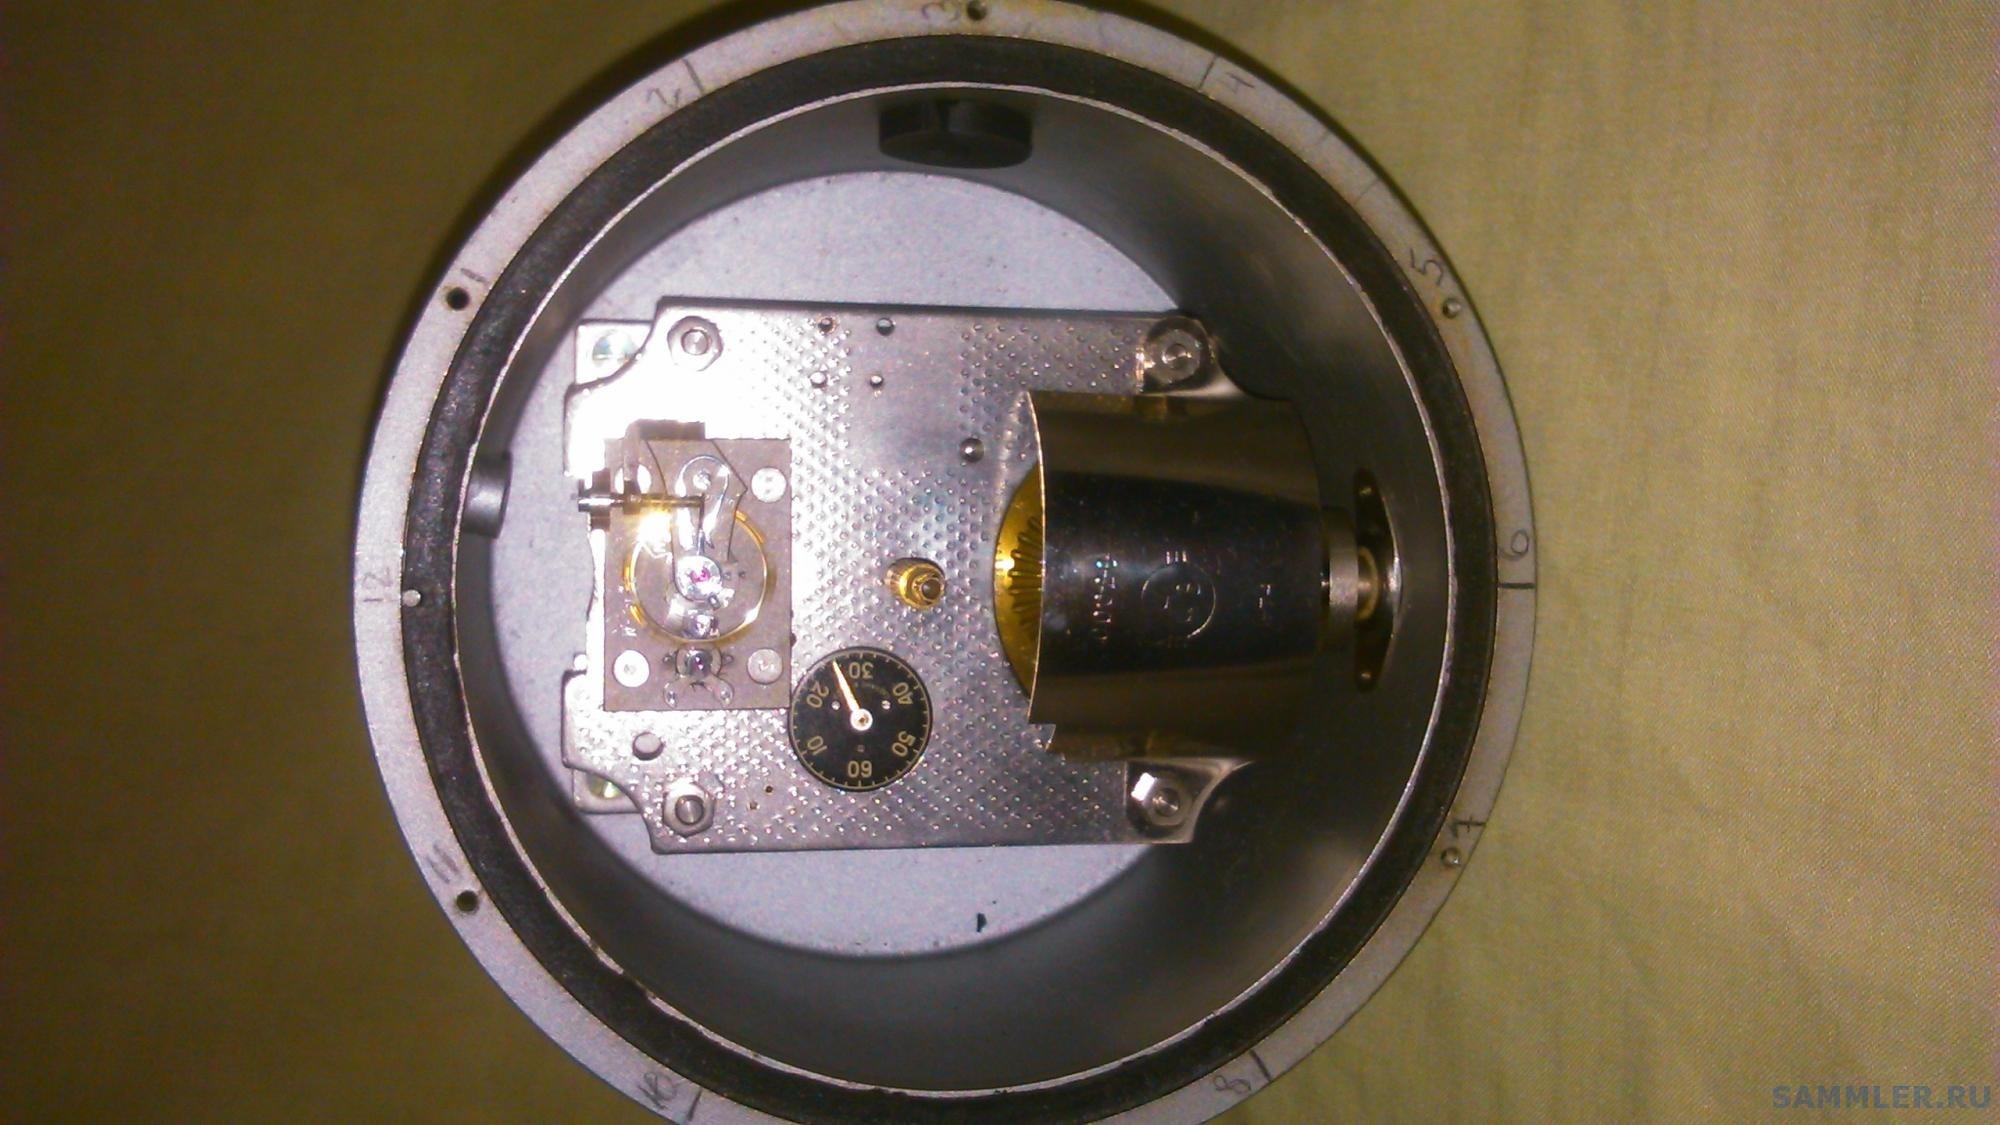 DSC_0008-1.JPG